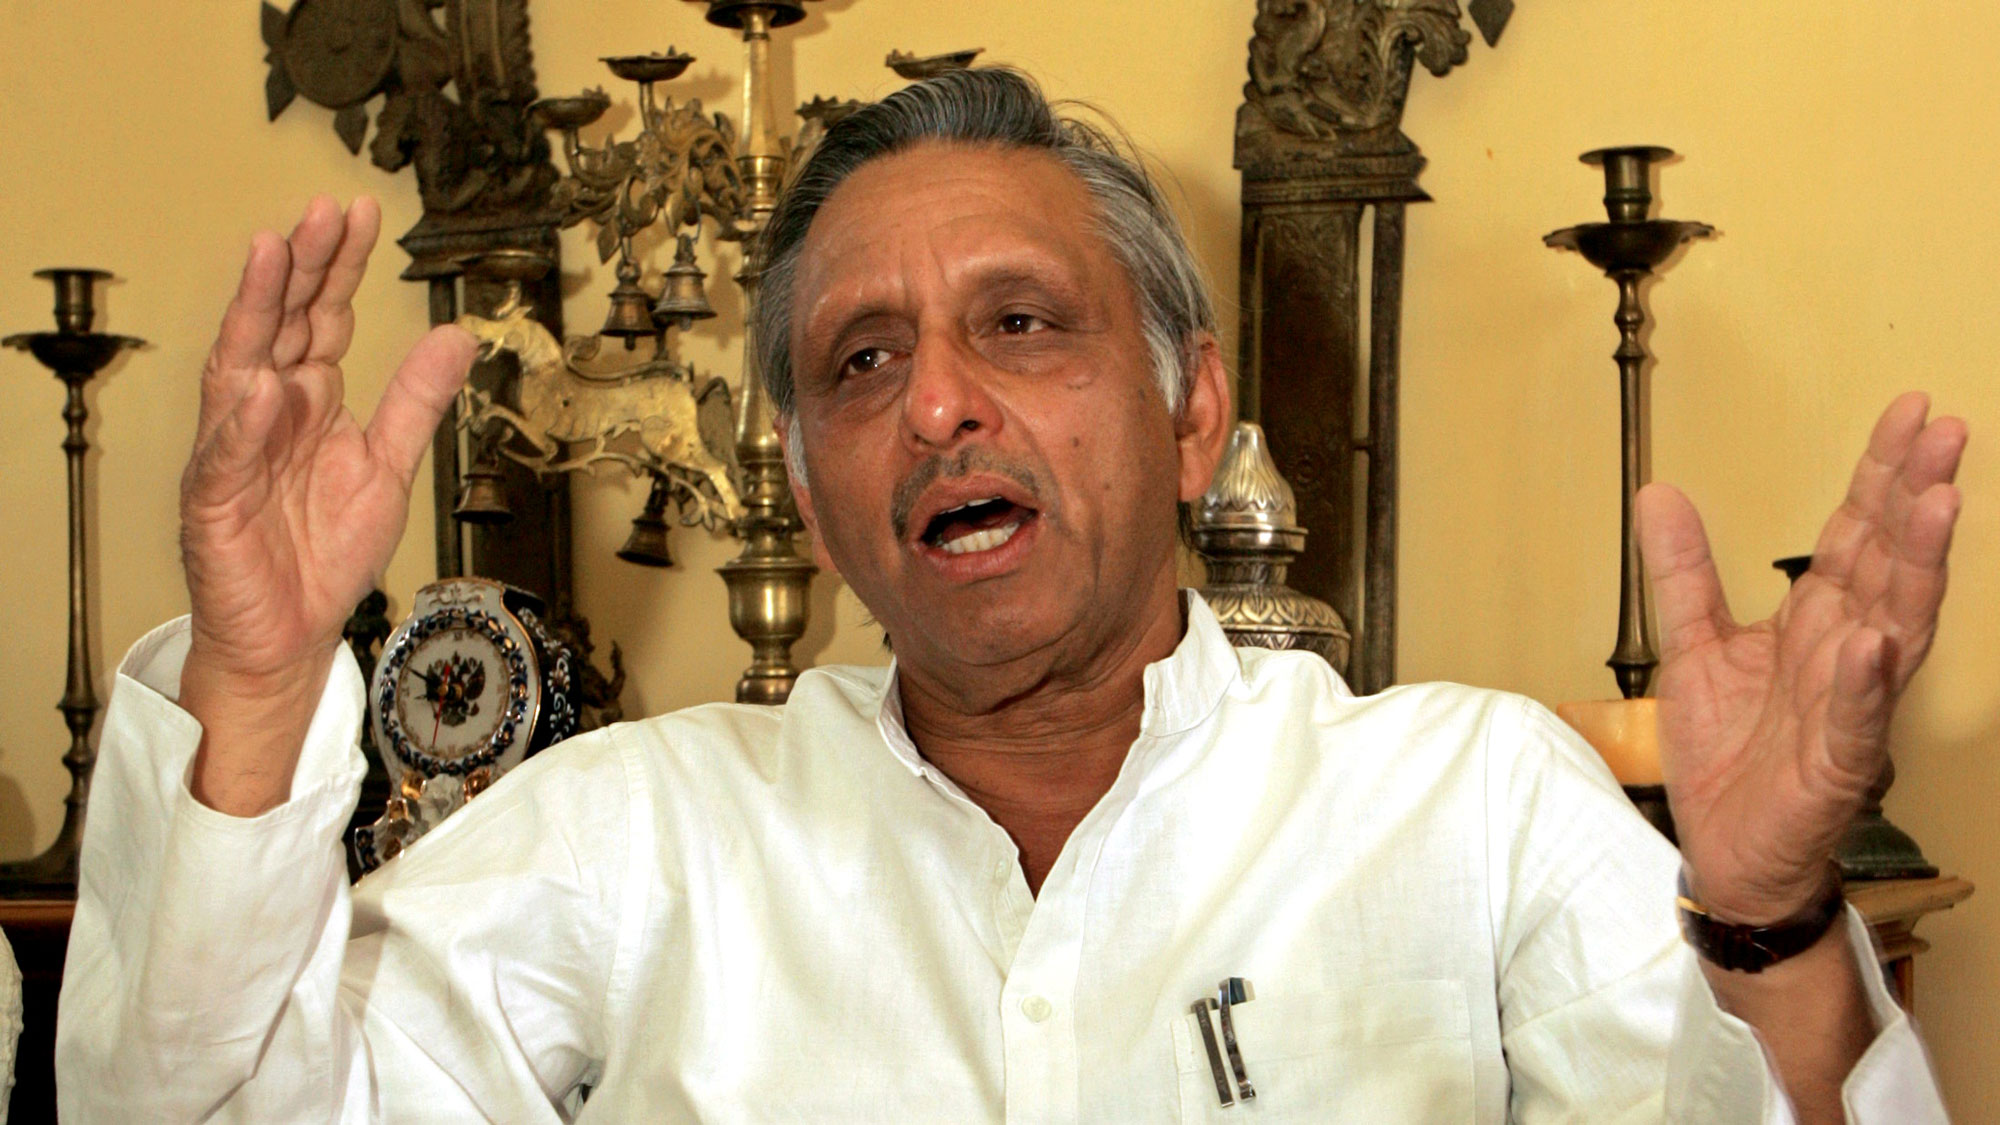 Congress leader Mani Shankar Aiyar. Credit: Reuters